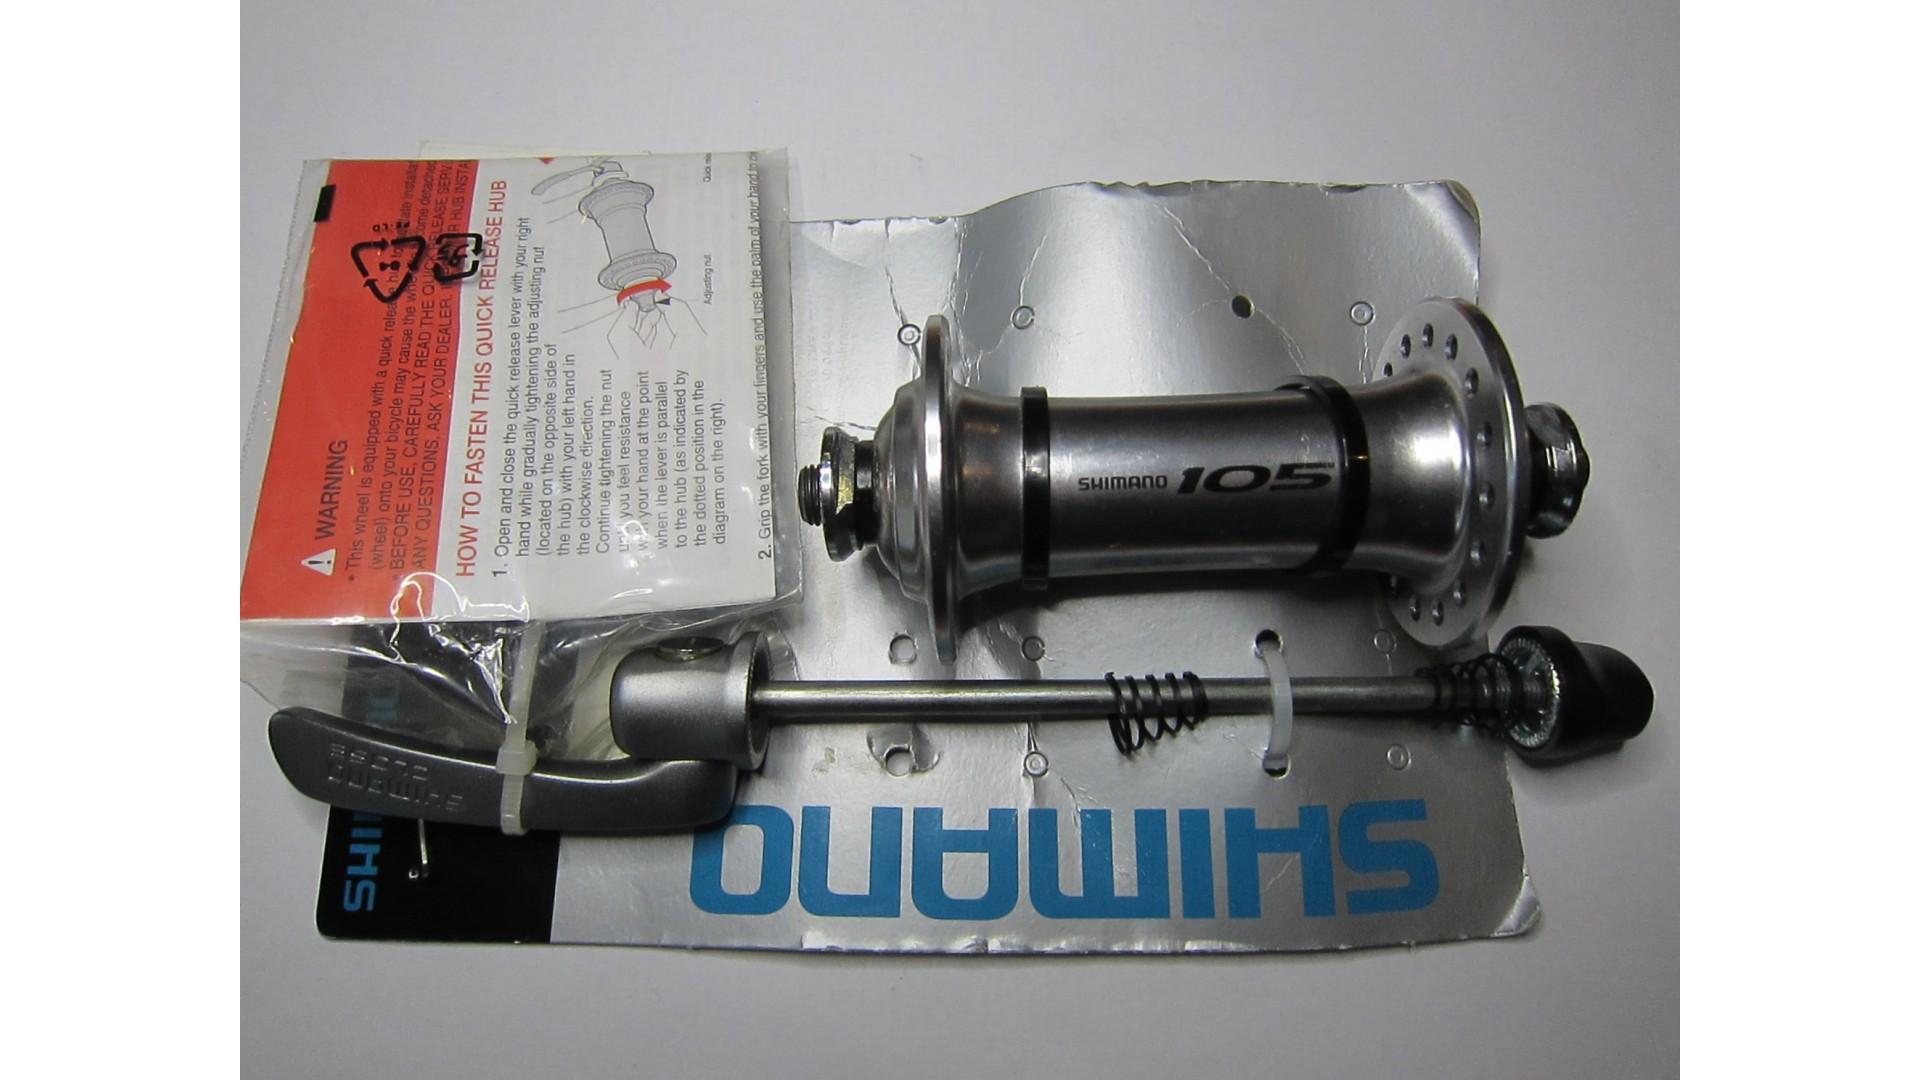 Втулка передн HB-5600 Shimano 105, 32сп